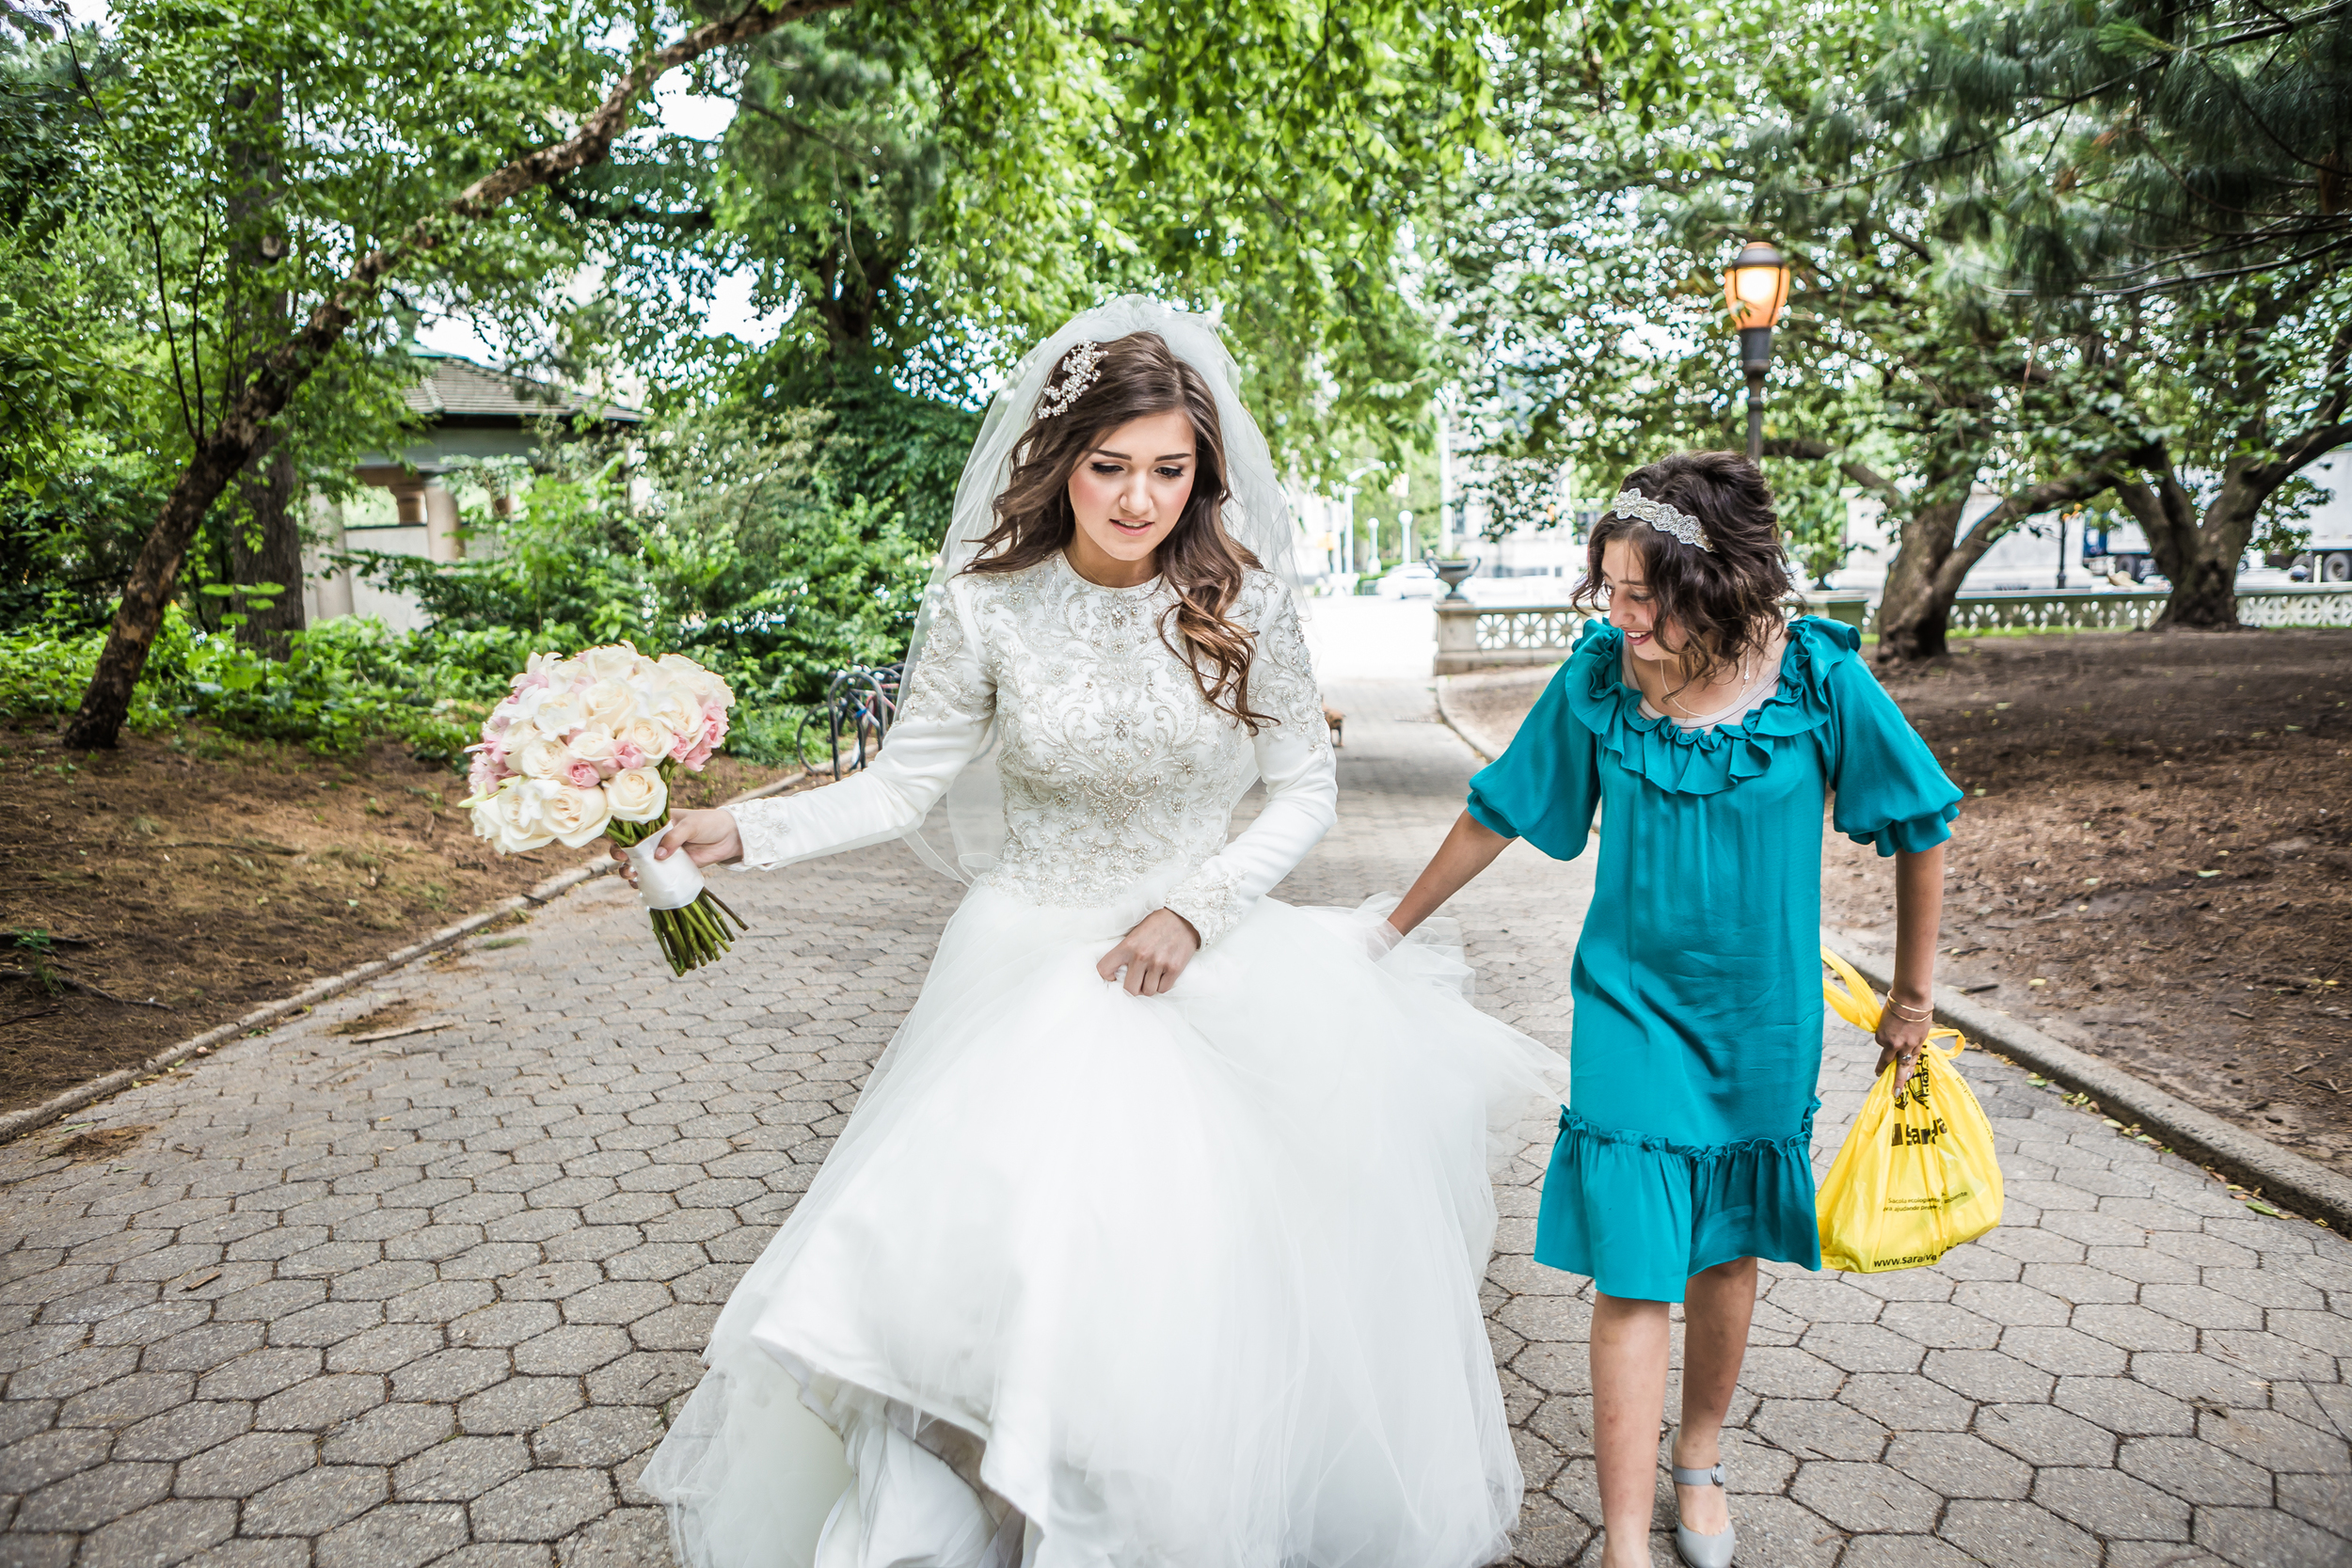 Wedding Iossi and Gitty Khafif  - Eliau Piha studio photography, new york, events, people 770 brooklyn -0074.jpg